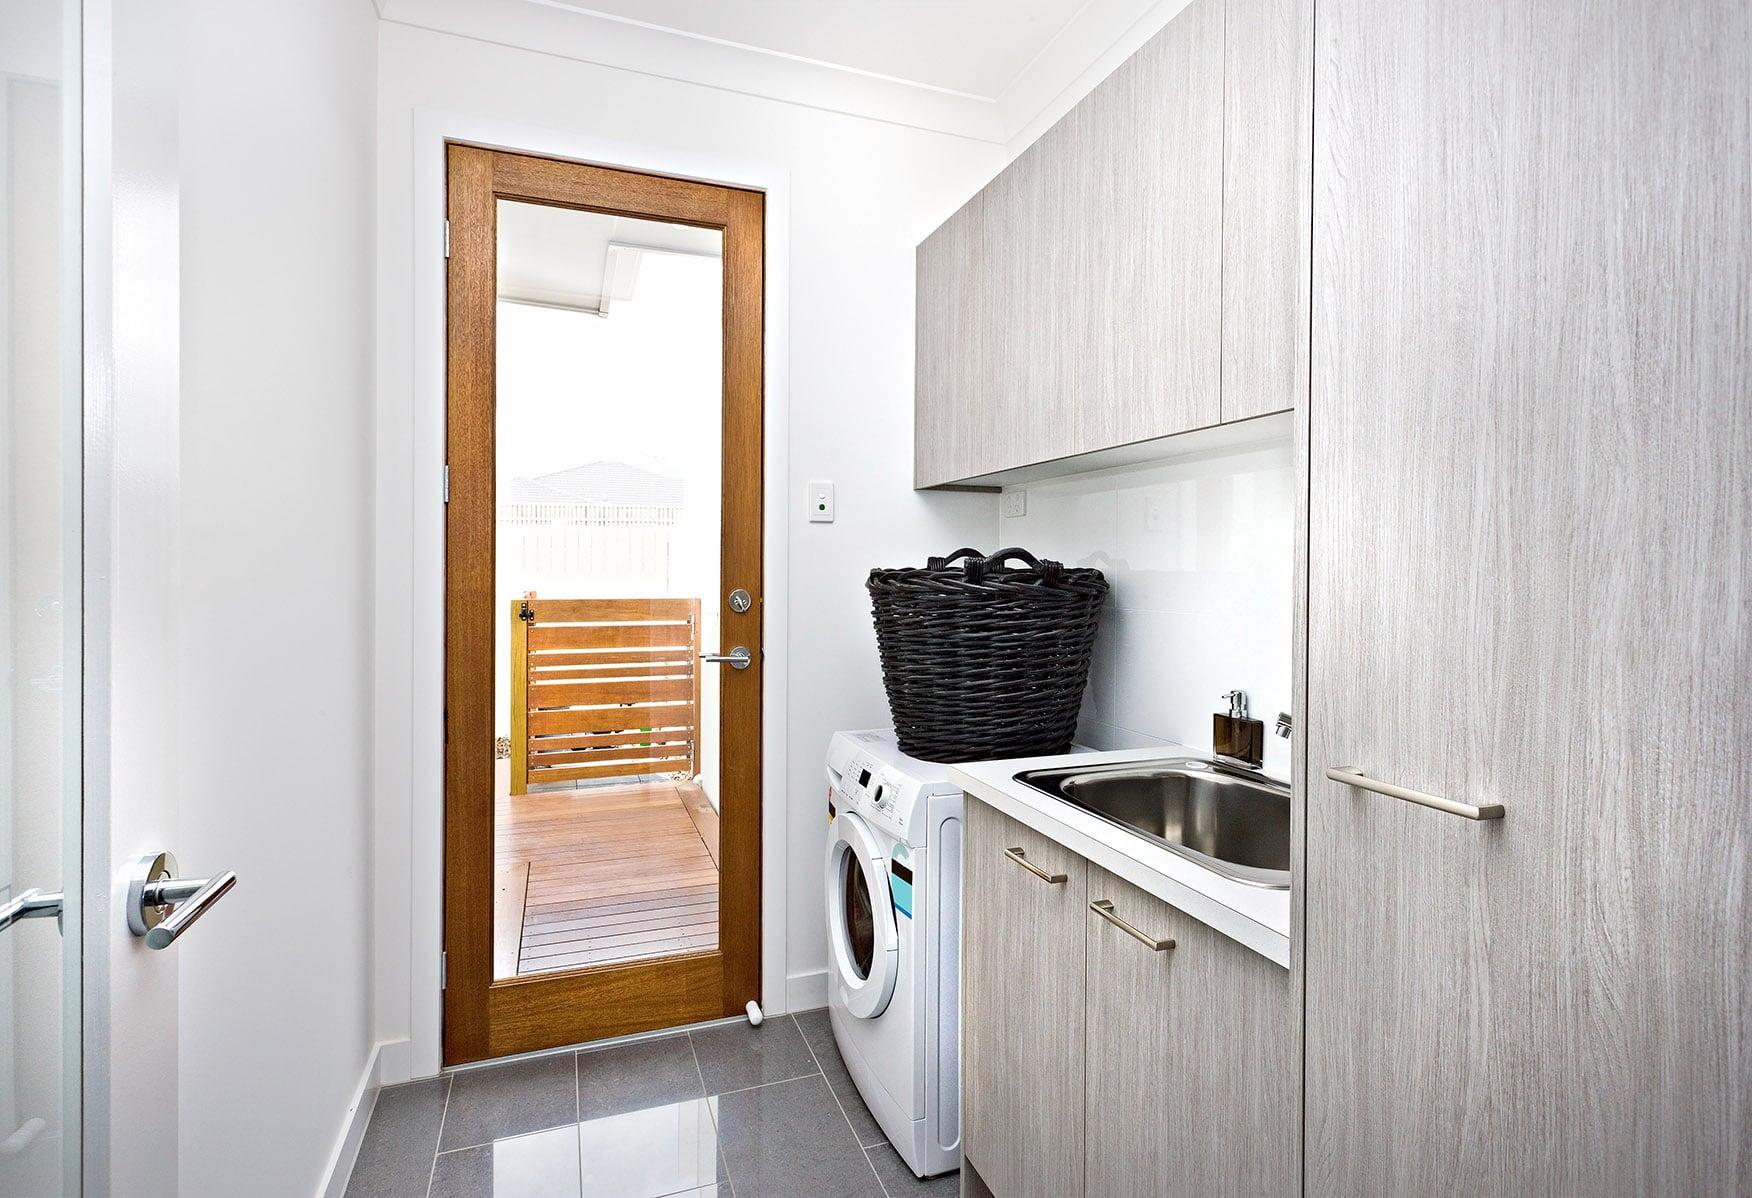 kitchen craftsmen kitchen renovation blog storage solutions laundry